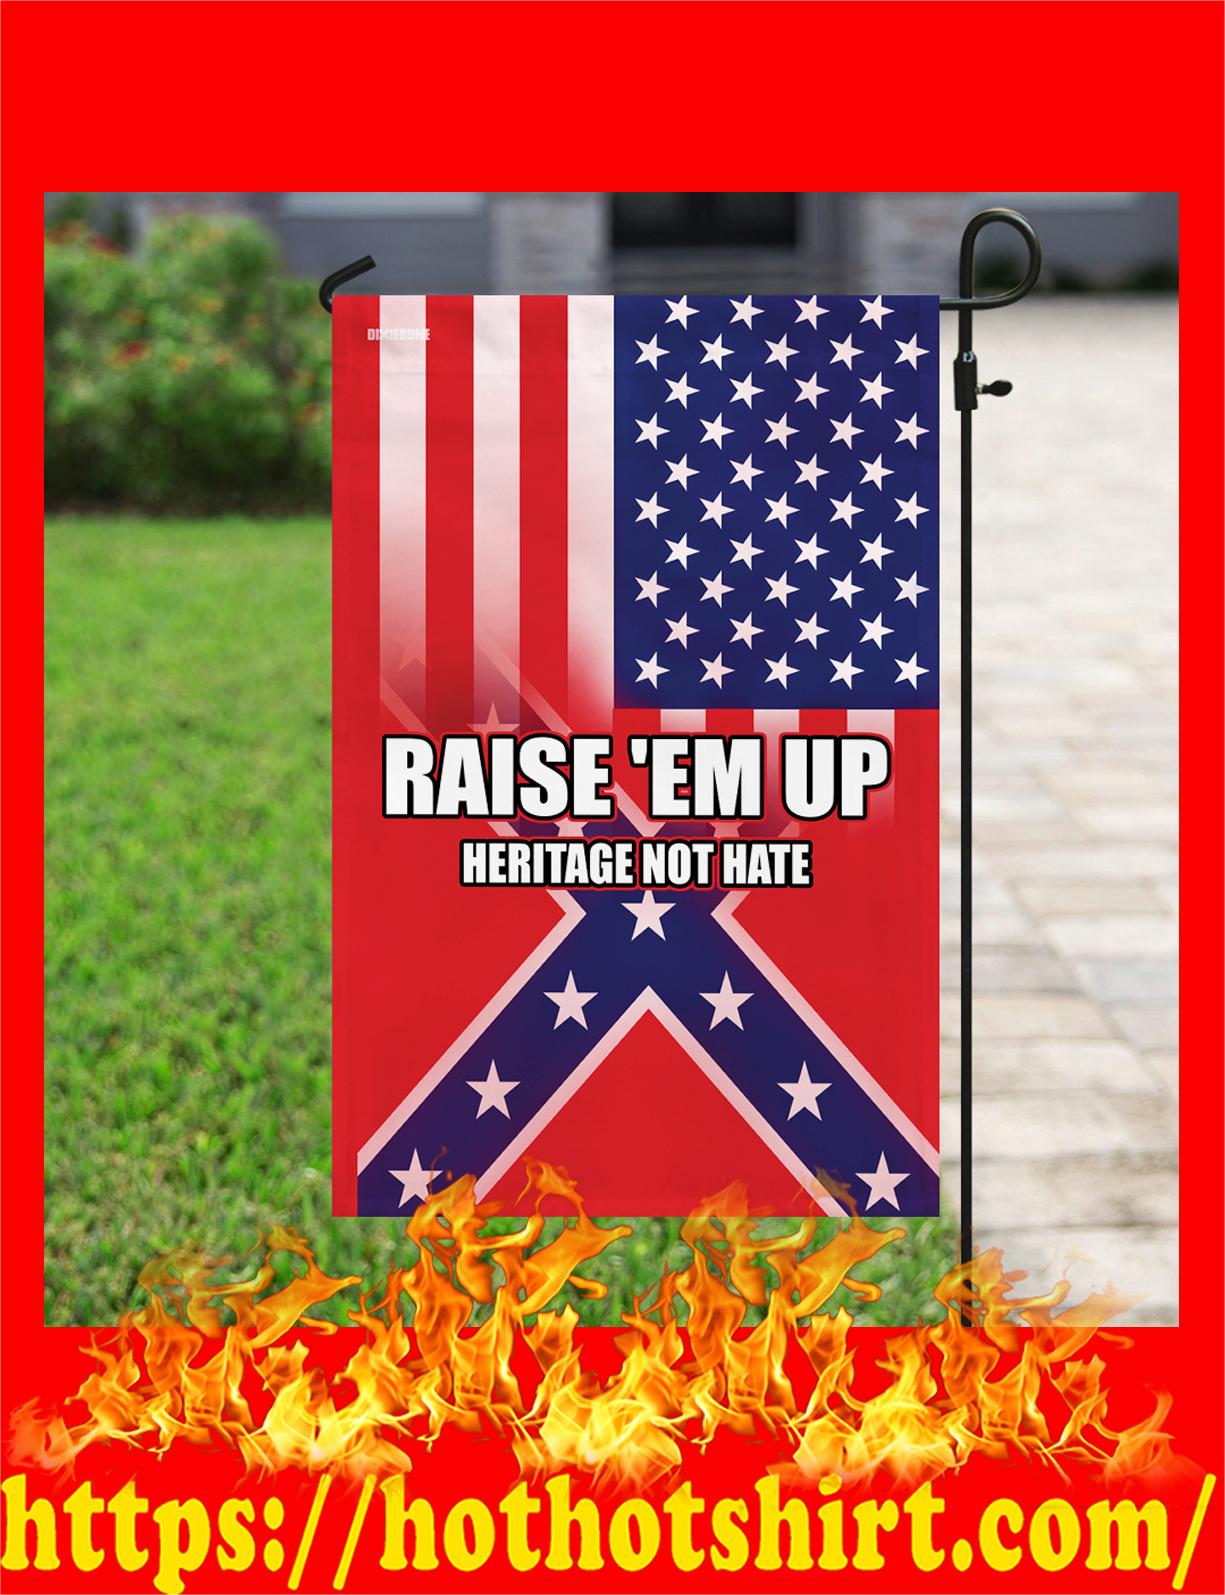 Raidse 'em up herritage not hate confederate american flag - detail